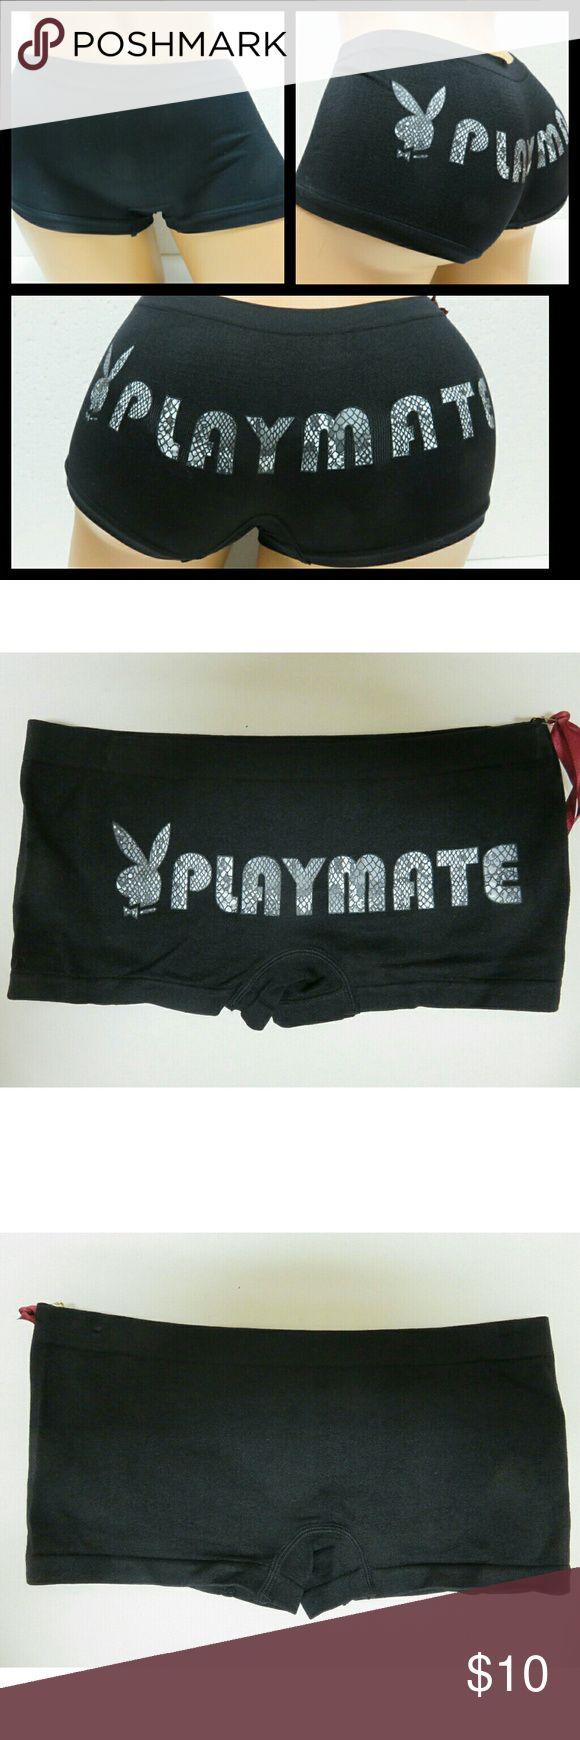 NWT Playboy Bunny Rabbit Playmate Boyshorts  Sz S LAST IN STOCK ........New stretch black, white n gray Playboy bunny boyshorts 90% nylon 10% spandex. Back has playmate in snake skin print. playboy  Intimates & Sleepwear Panties